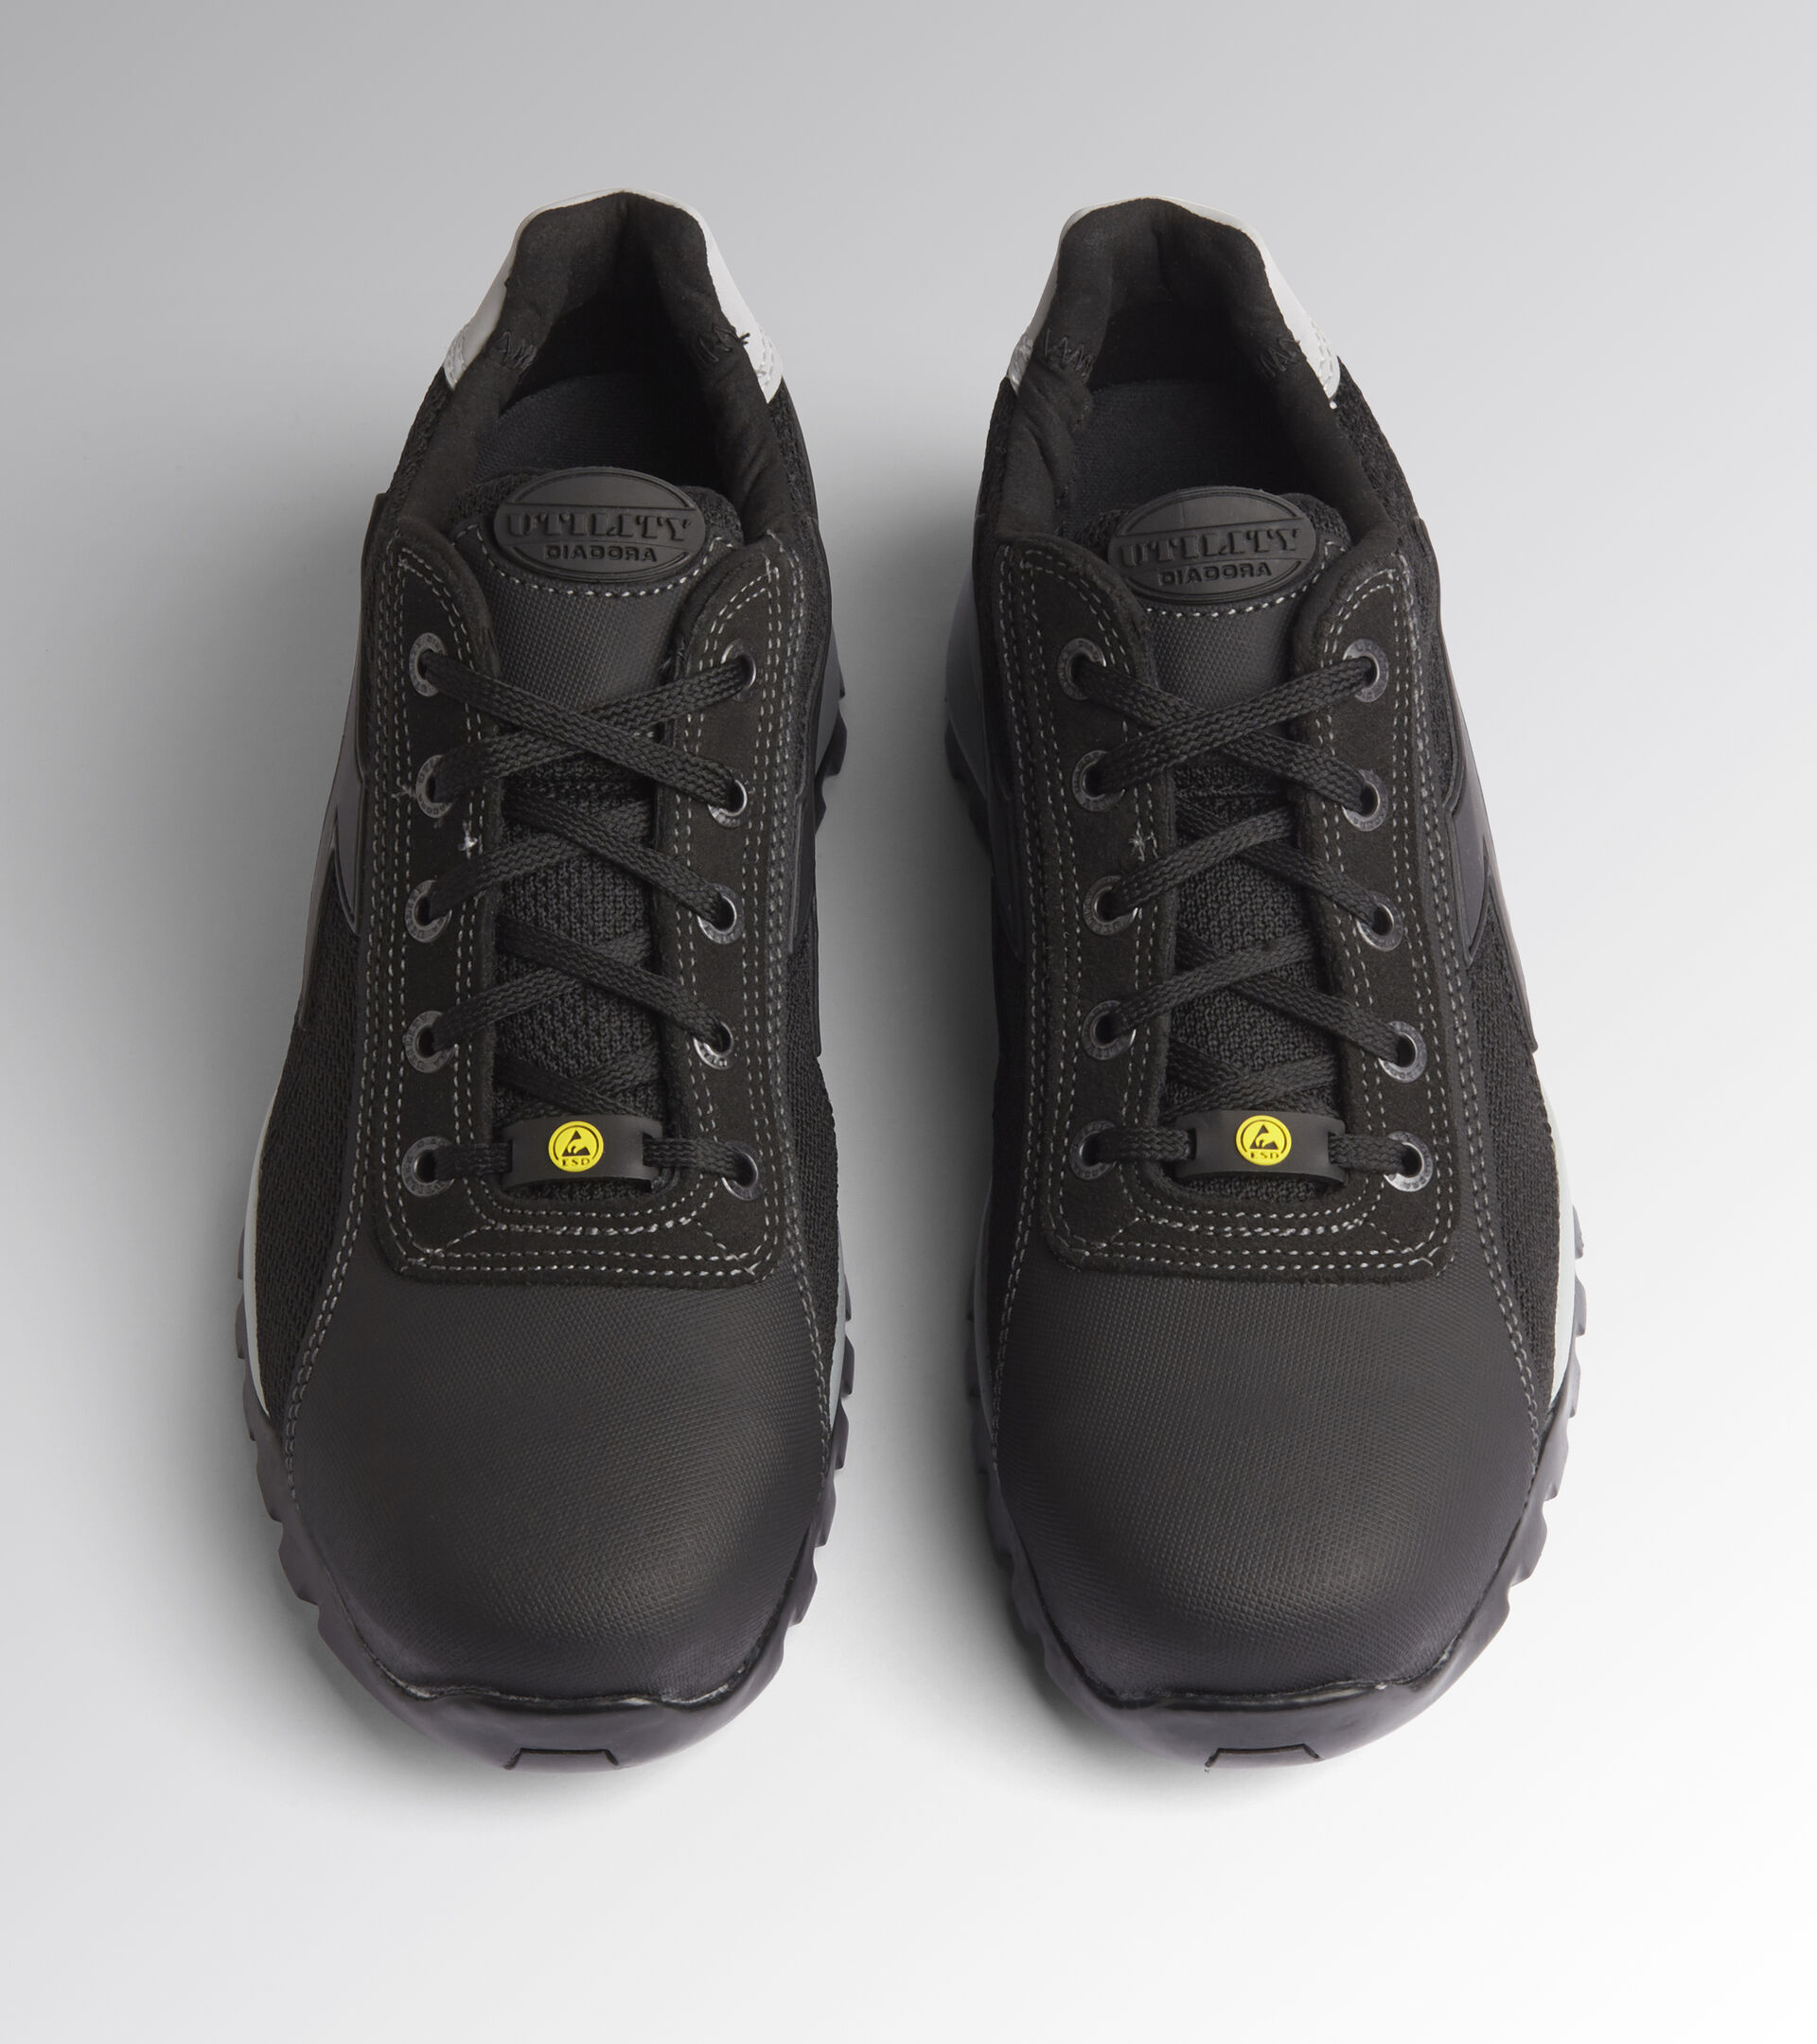 Footwear Utility UNISEX GLOVE NET LOW PRO S1P HRO SRA ESD SCHWARZ Utility